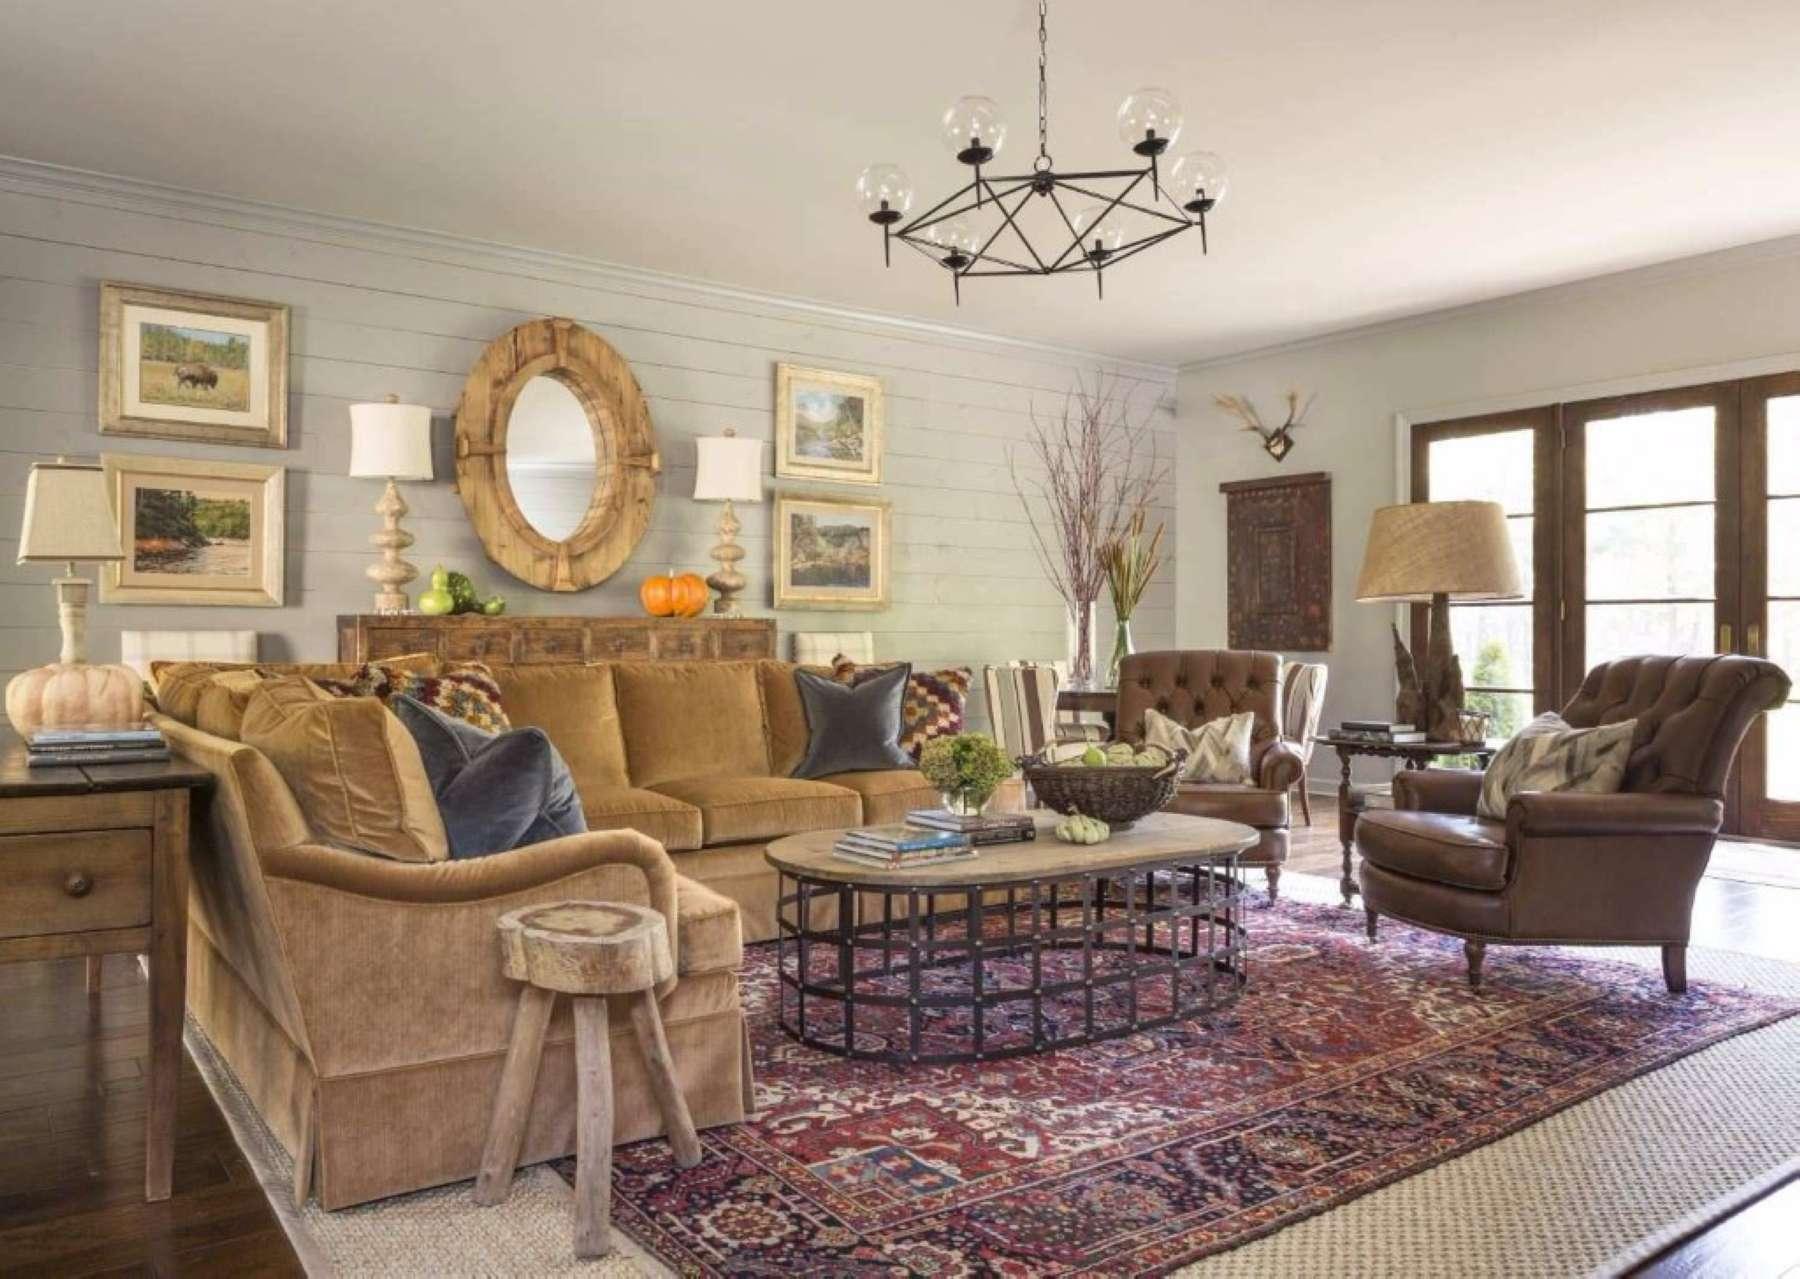 Arkansas-interior-design-Southern-Comfort-k-lewis-interior-design-IMG_005